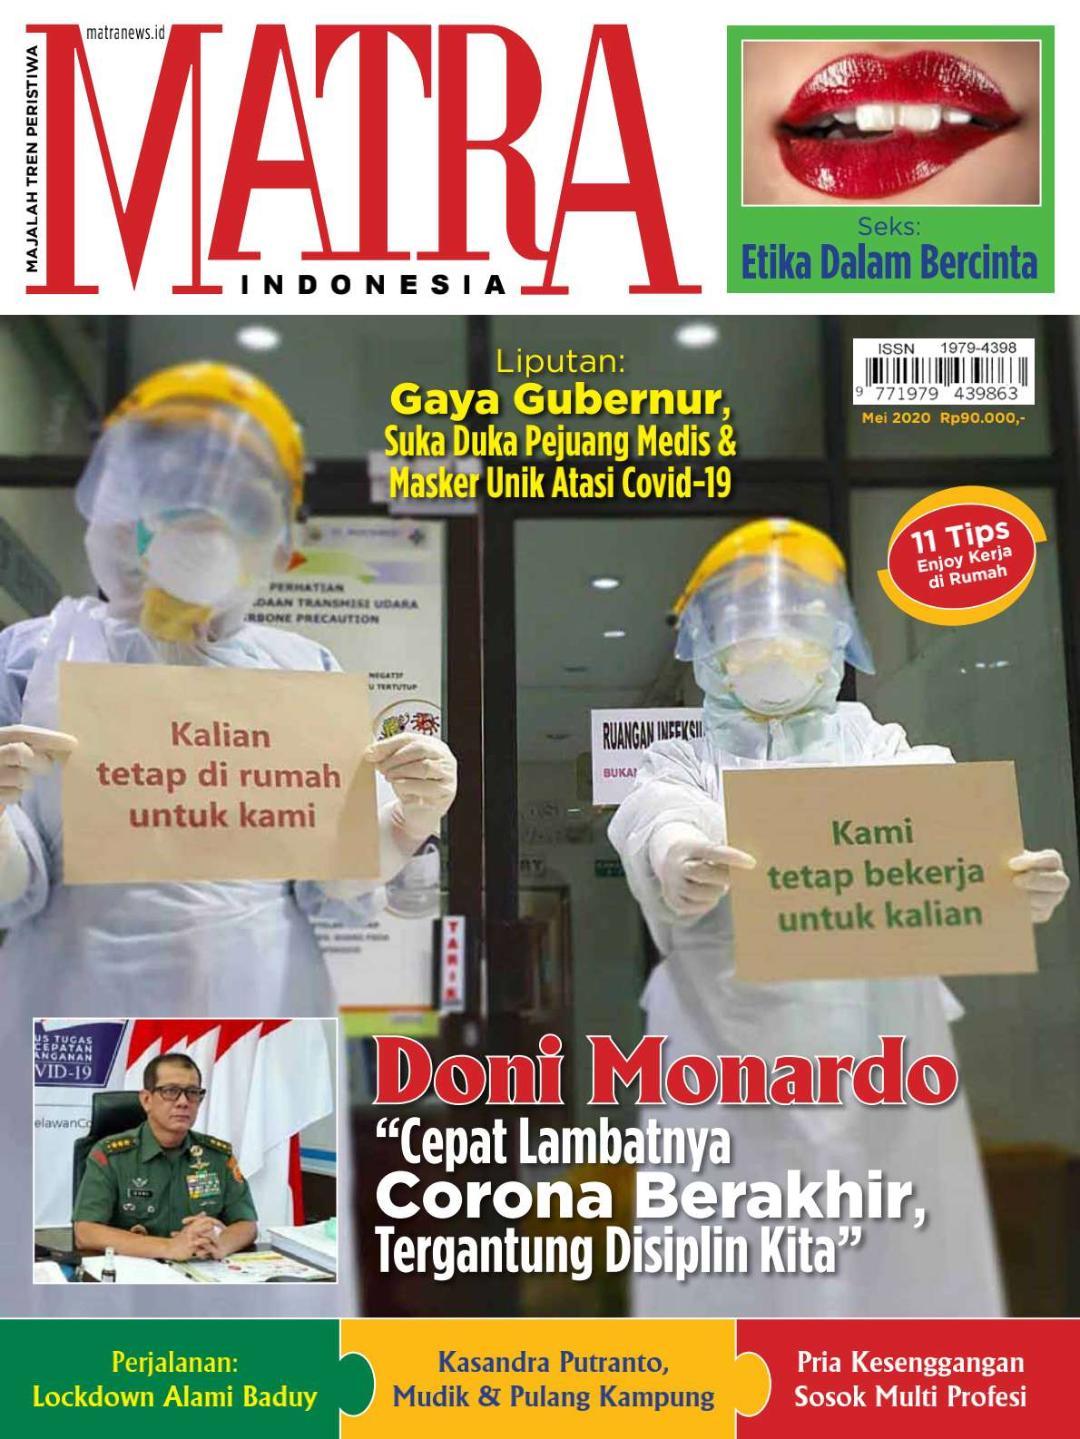 Dinamika MATRA Dalam Distribusi Media Cetak, E-Magazine Solusi Lain